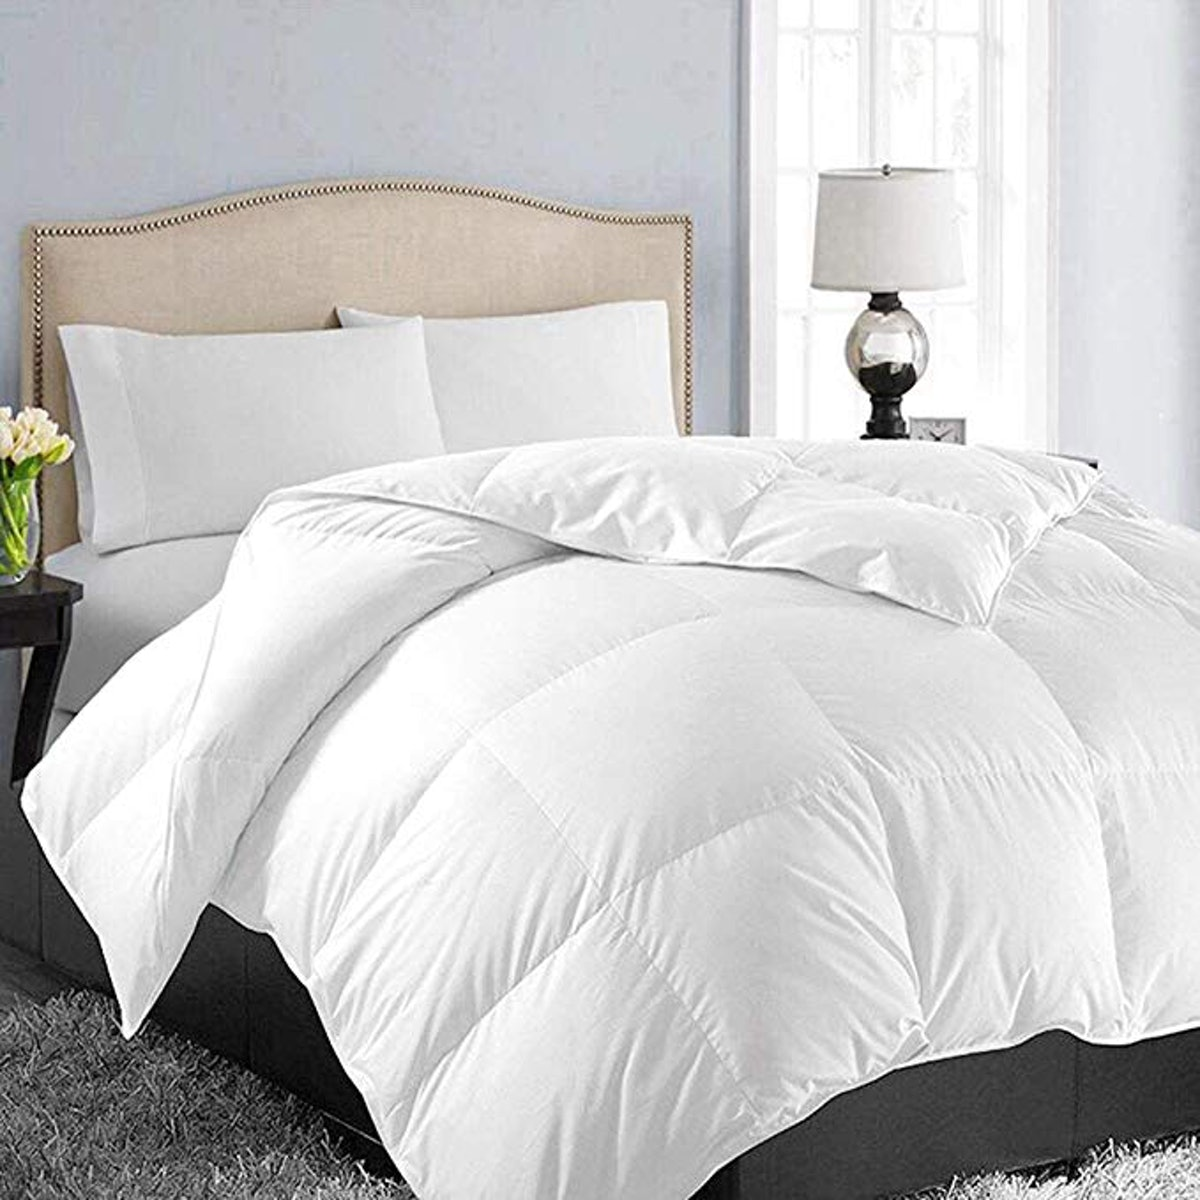 EASELAND Queen Size Down Comforter